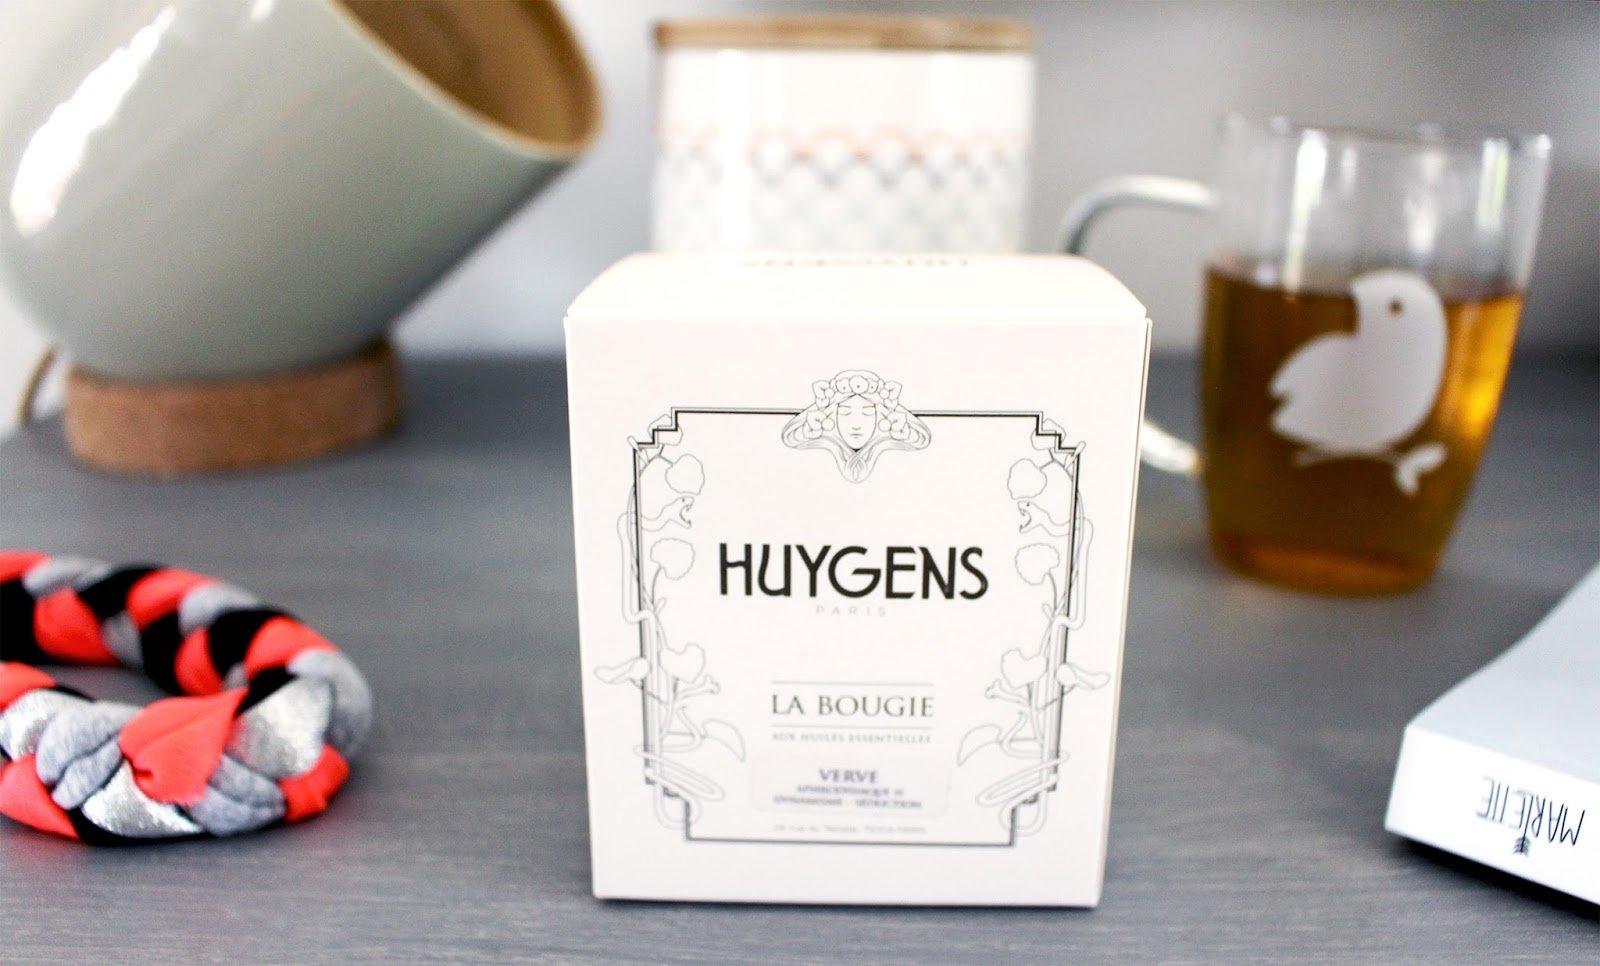 Bougie Huygens